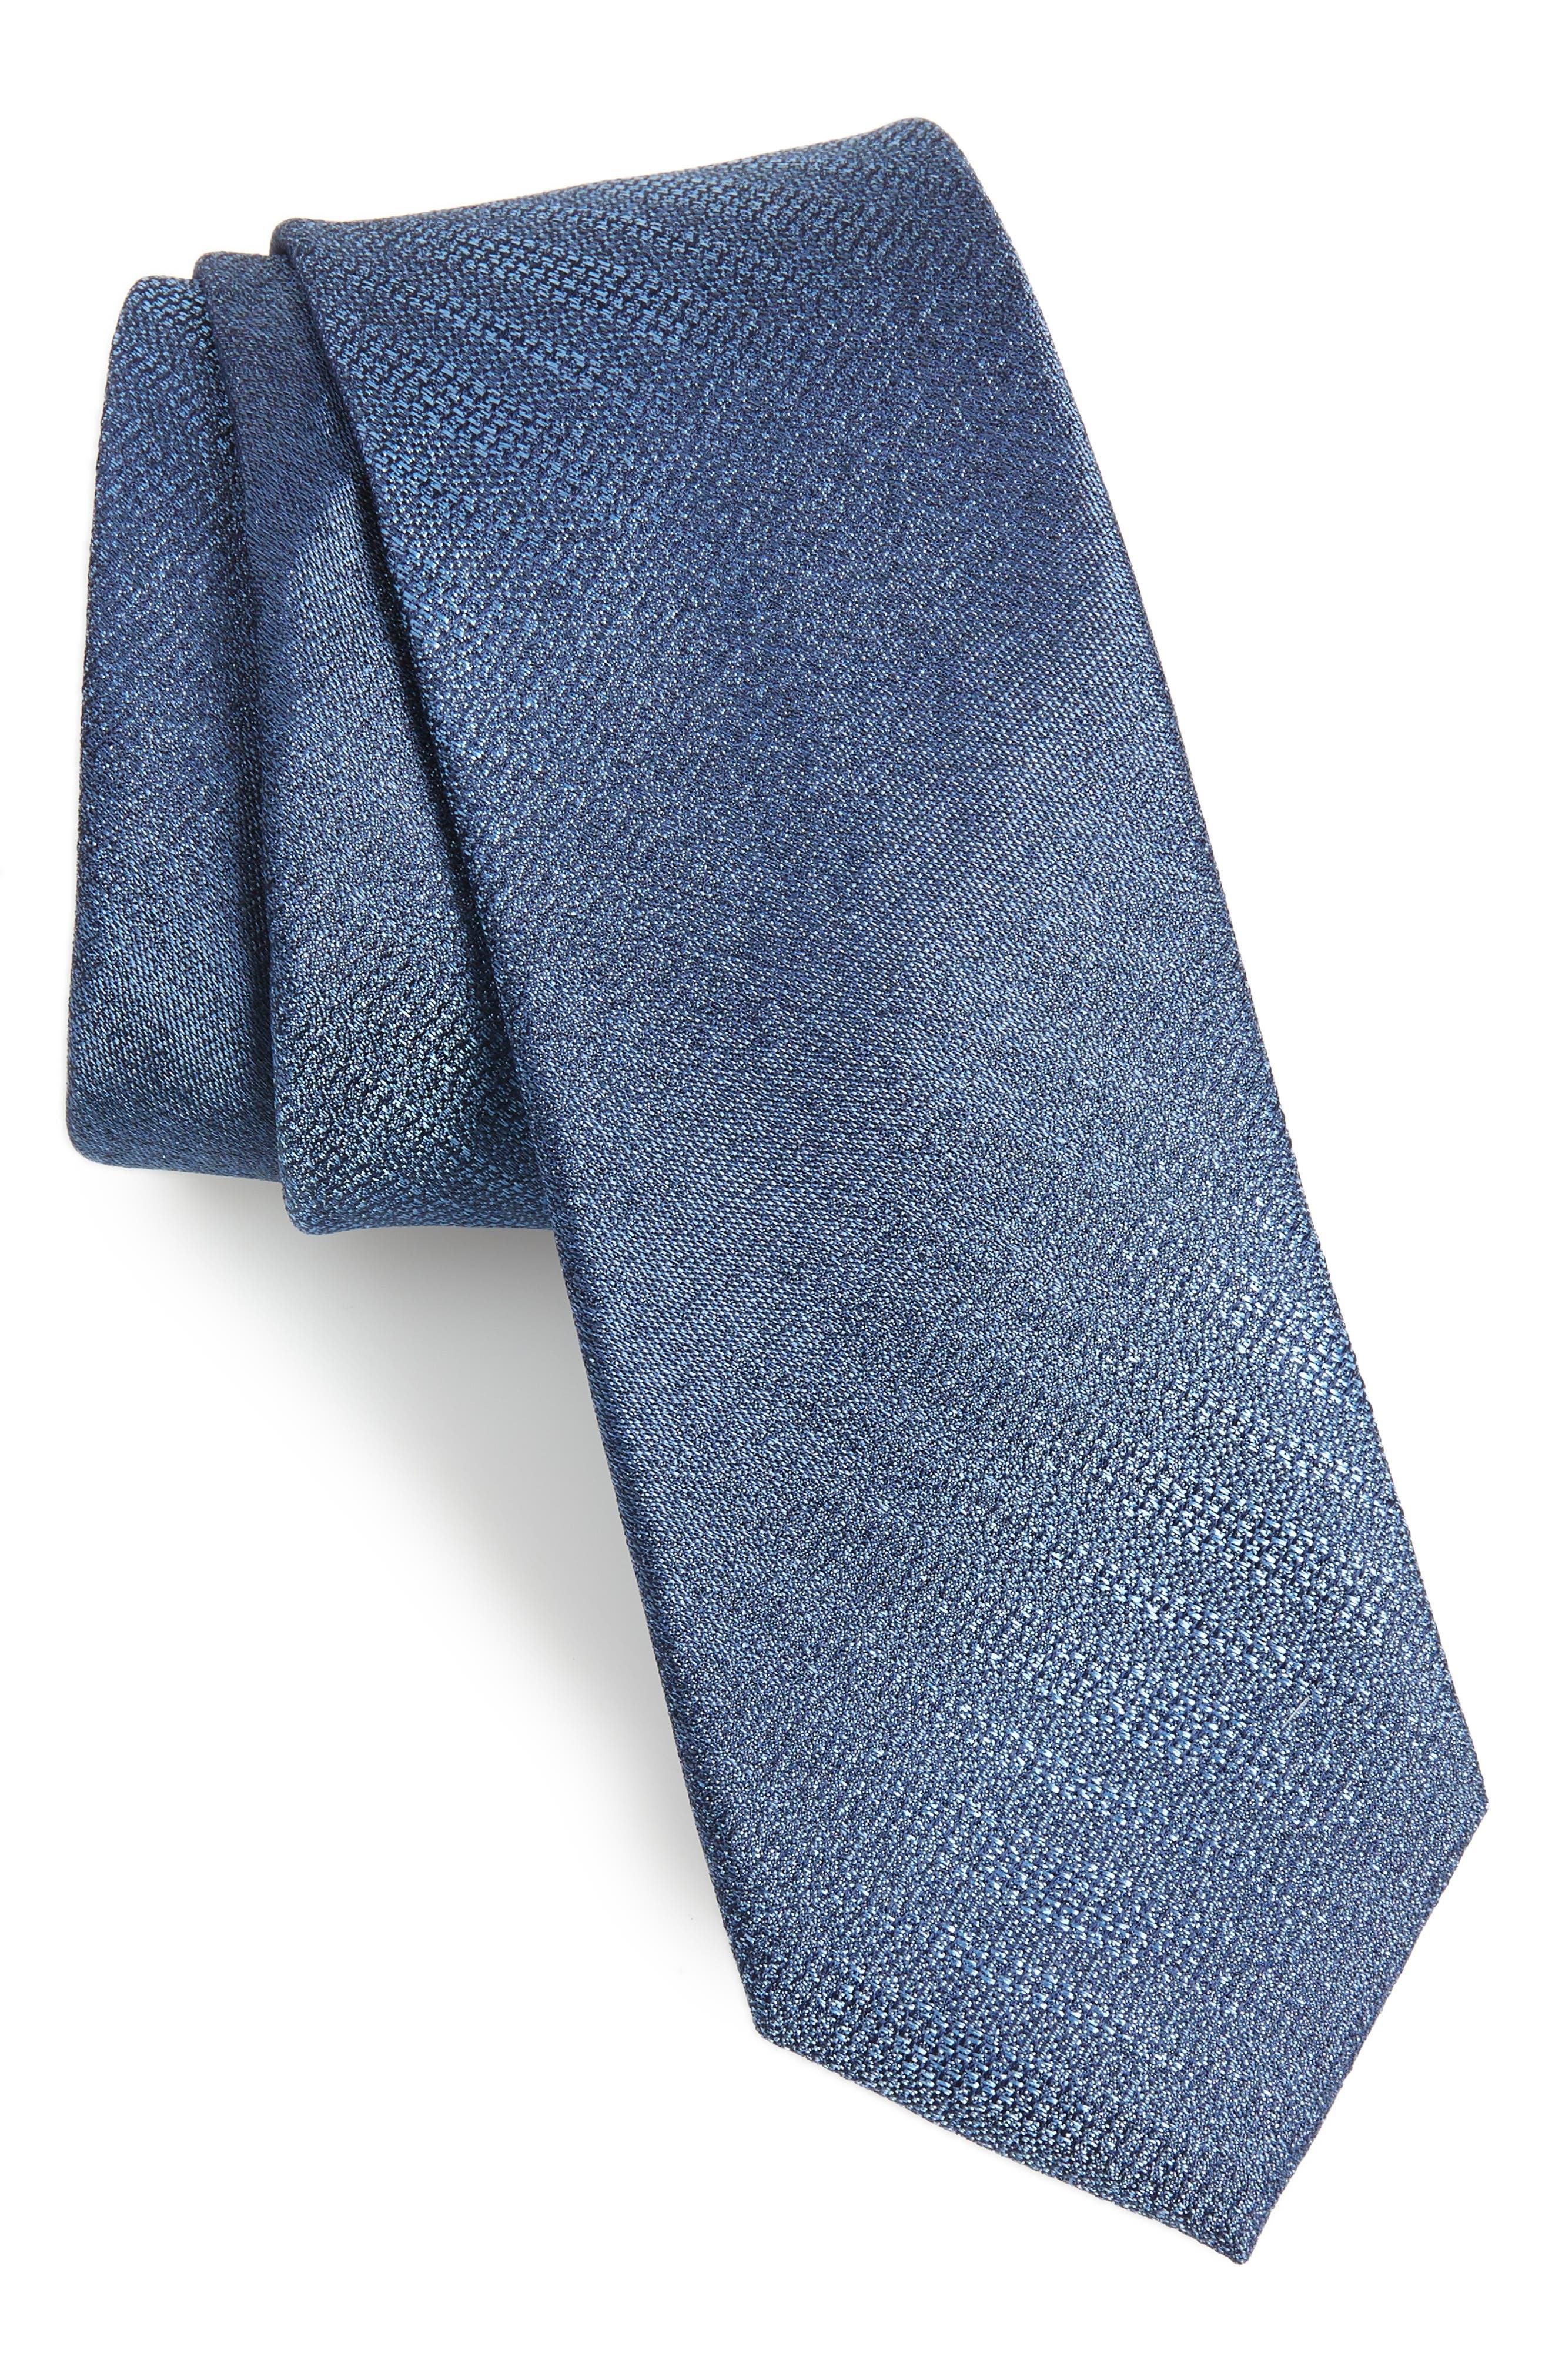 Gneiss Stripe Silk Skinny Tie,                         Main,                         color, 410